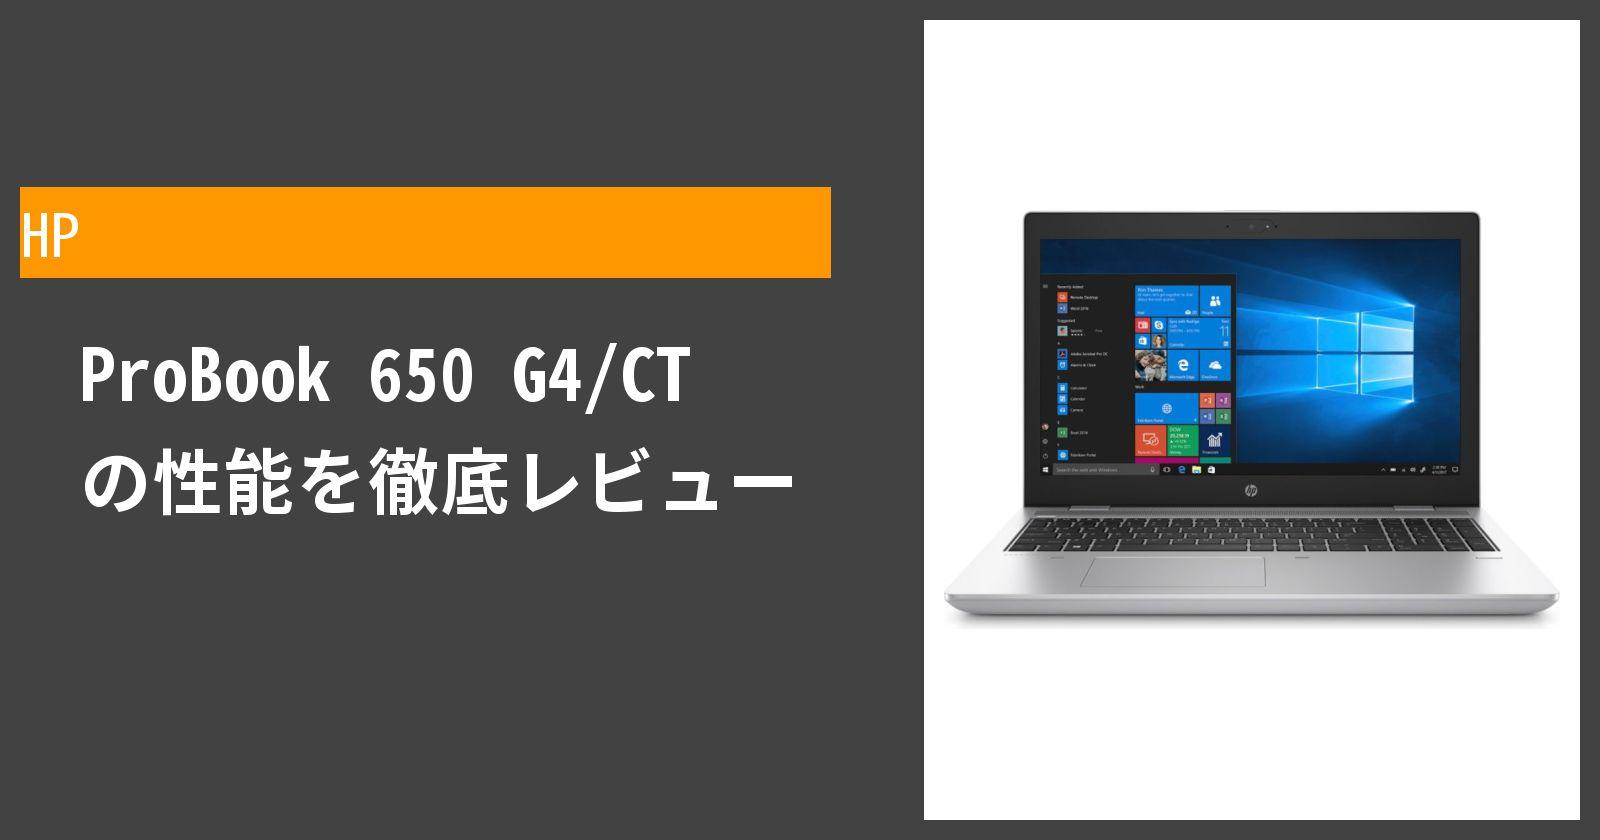 ProBook 650 G4/CT の性能を徹底レビュー